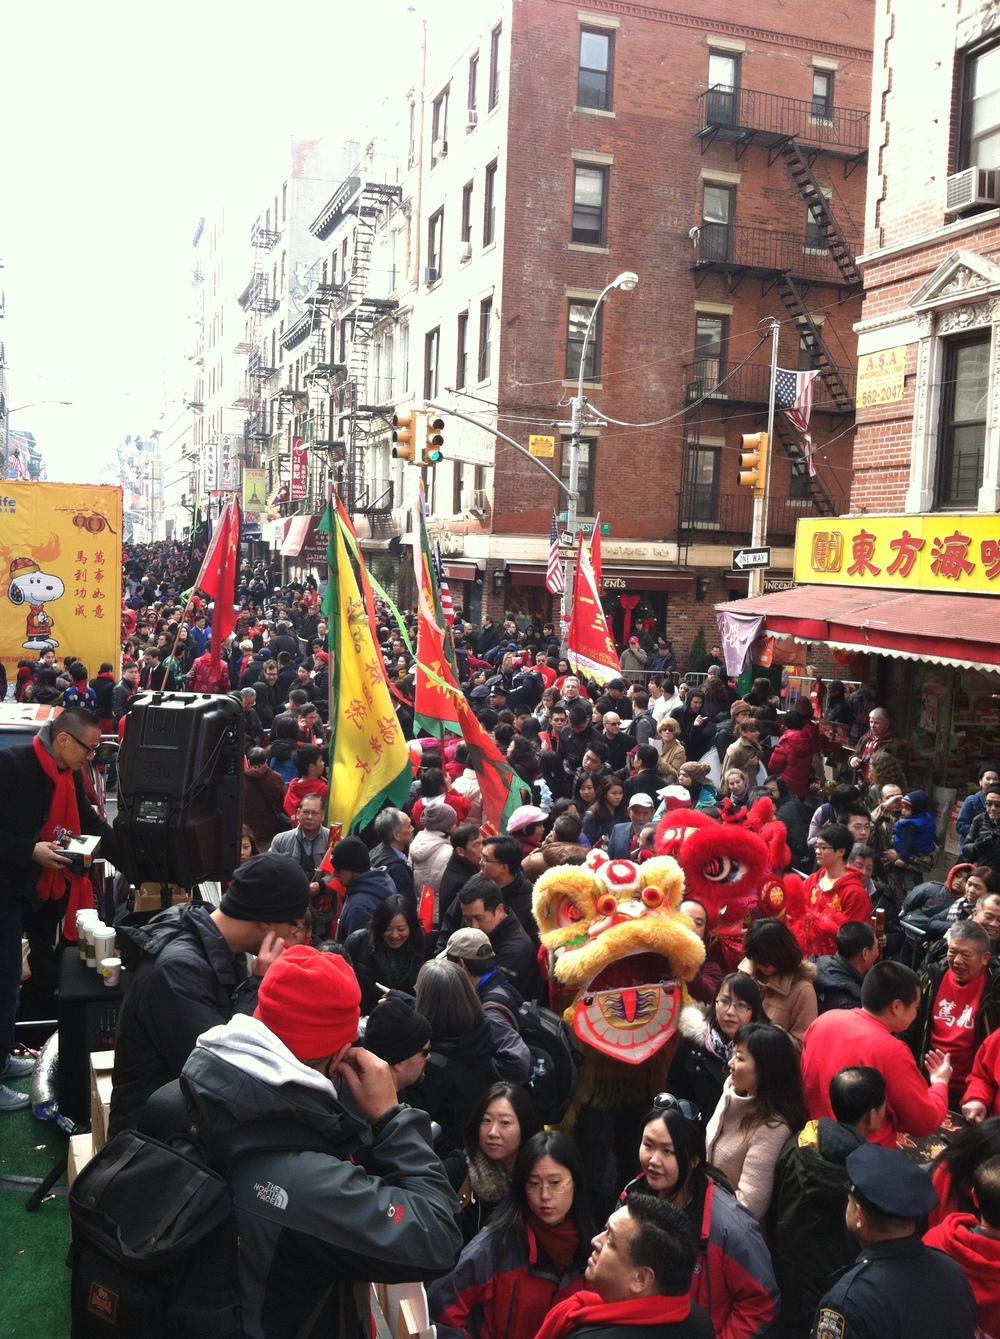 NYC Chinatown Parade.JPG